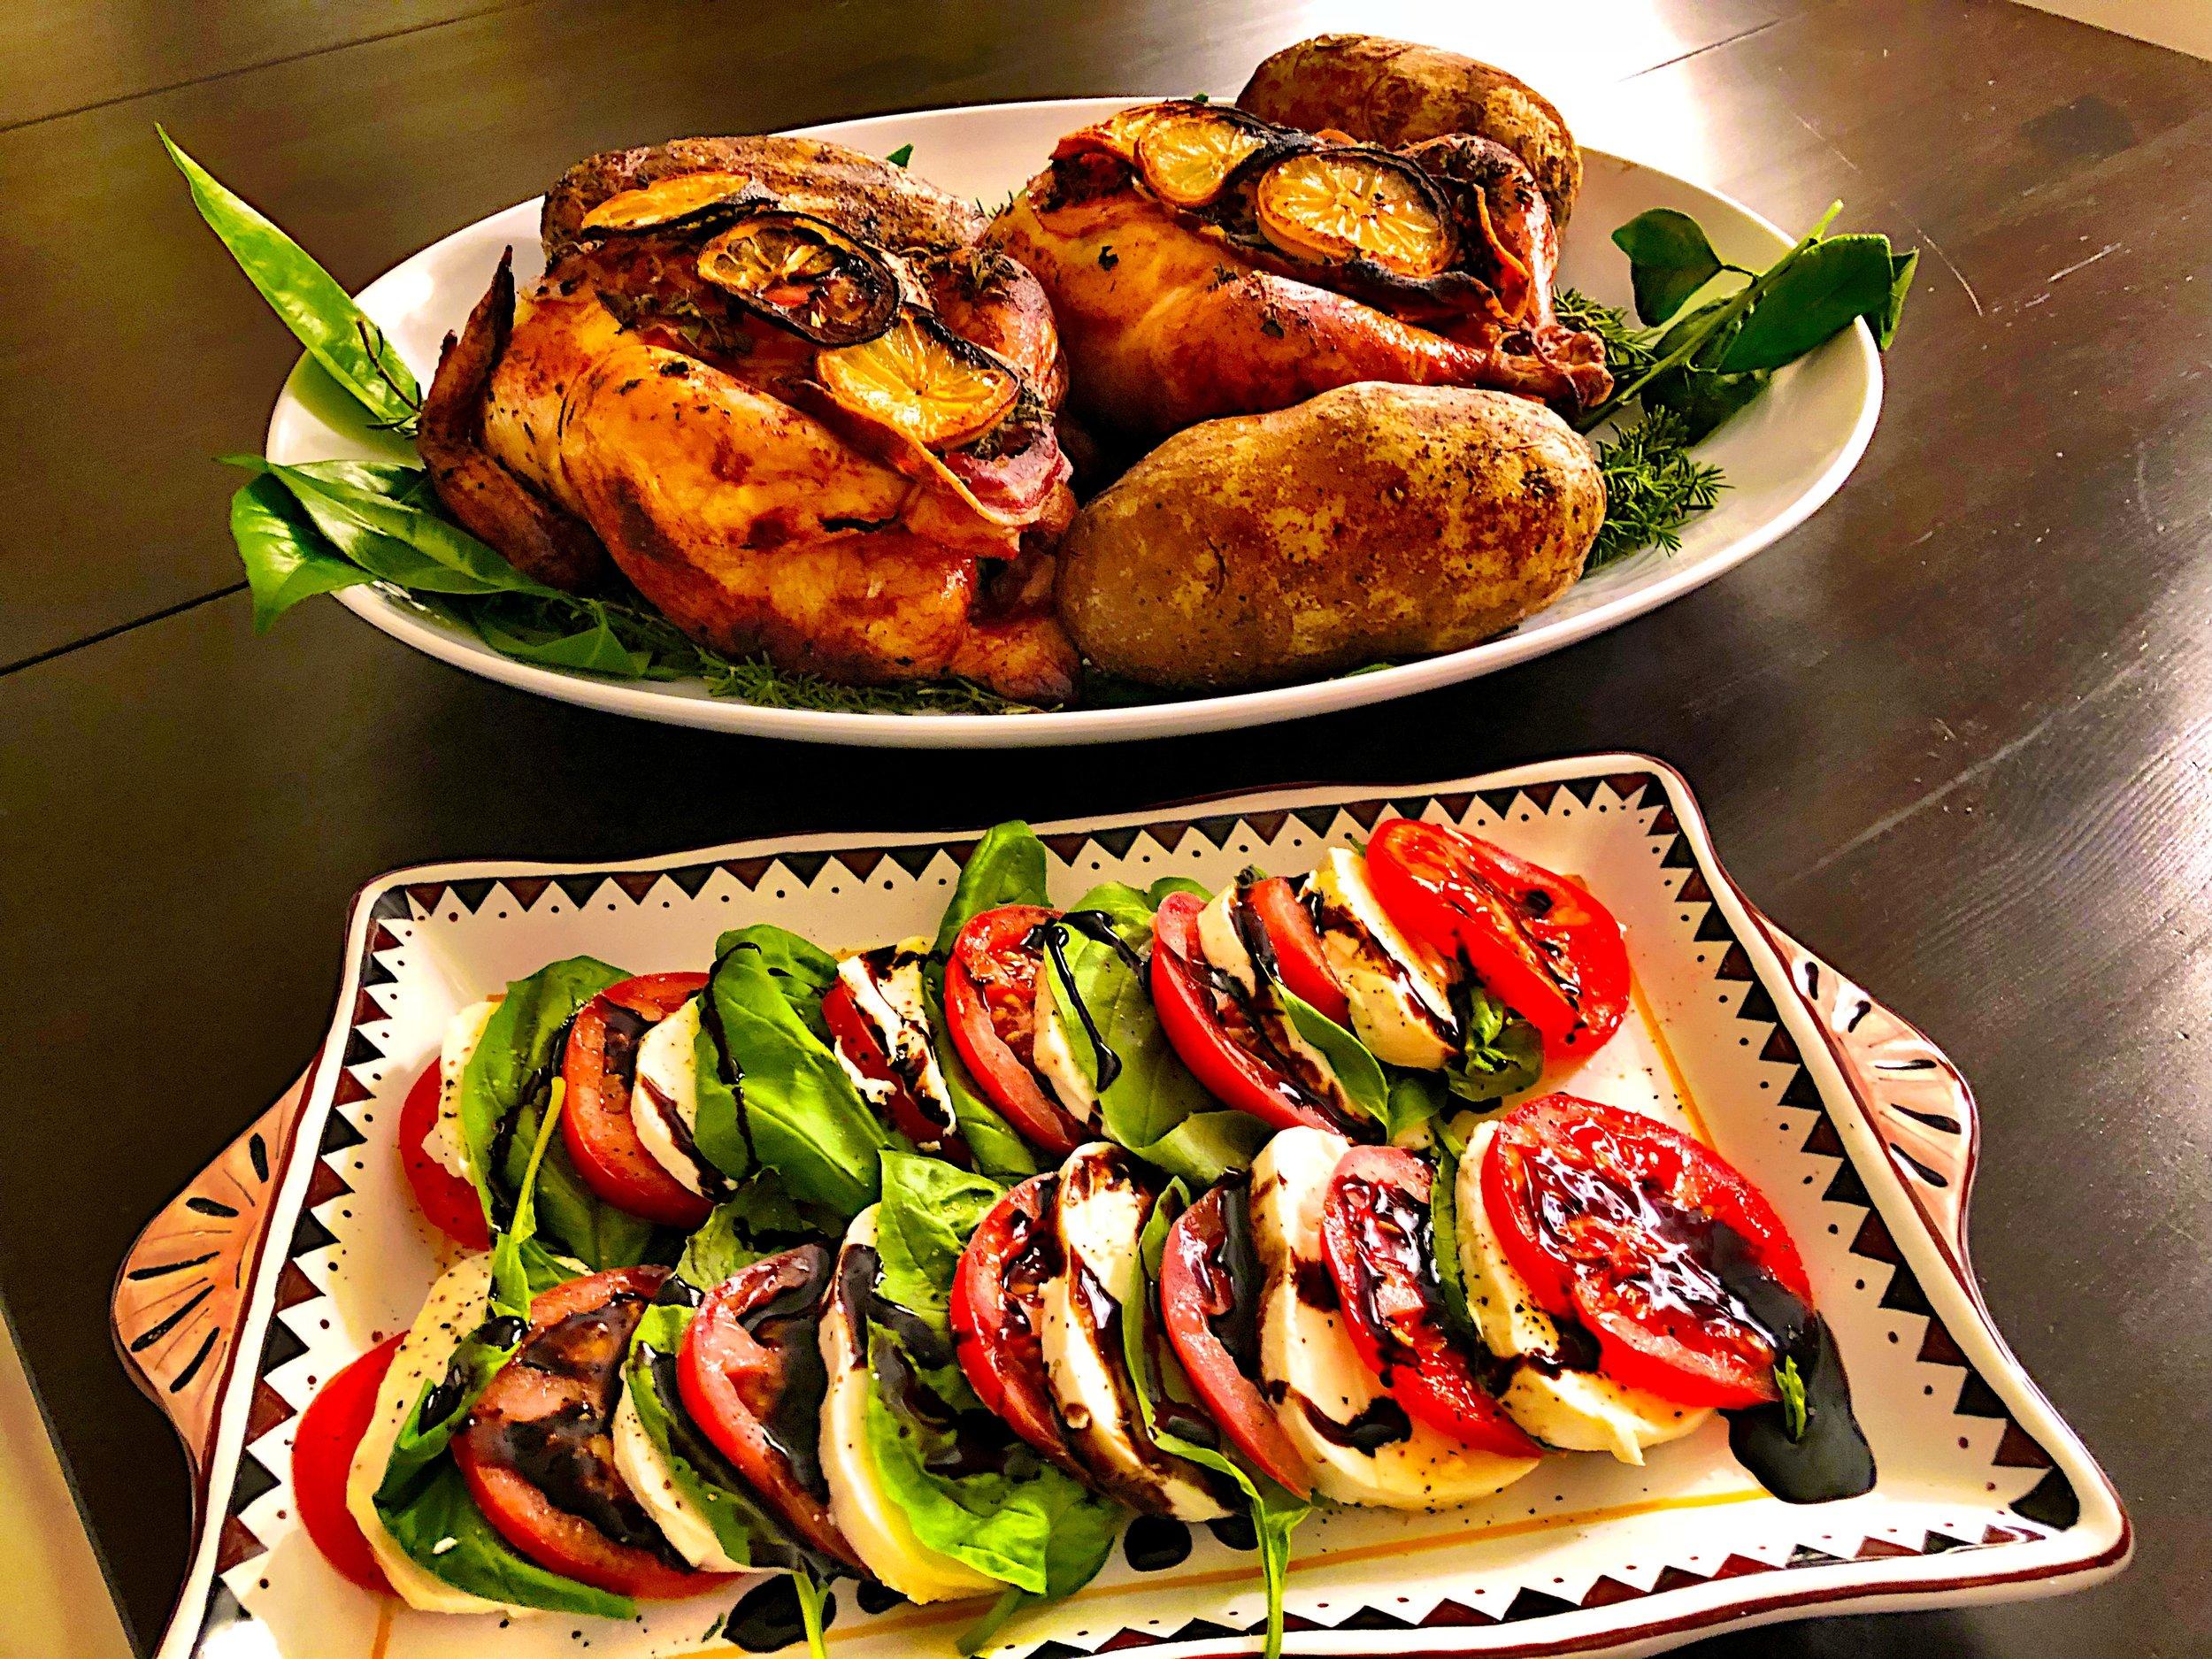 MC's lemon and herb rotisserie chicken, baked potato, and caprese salad.